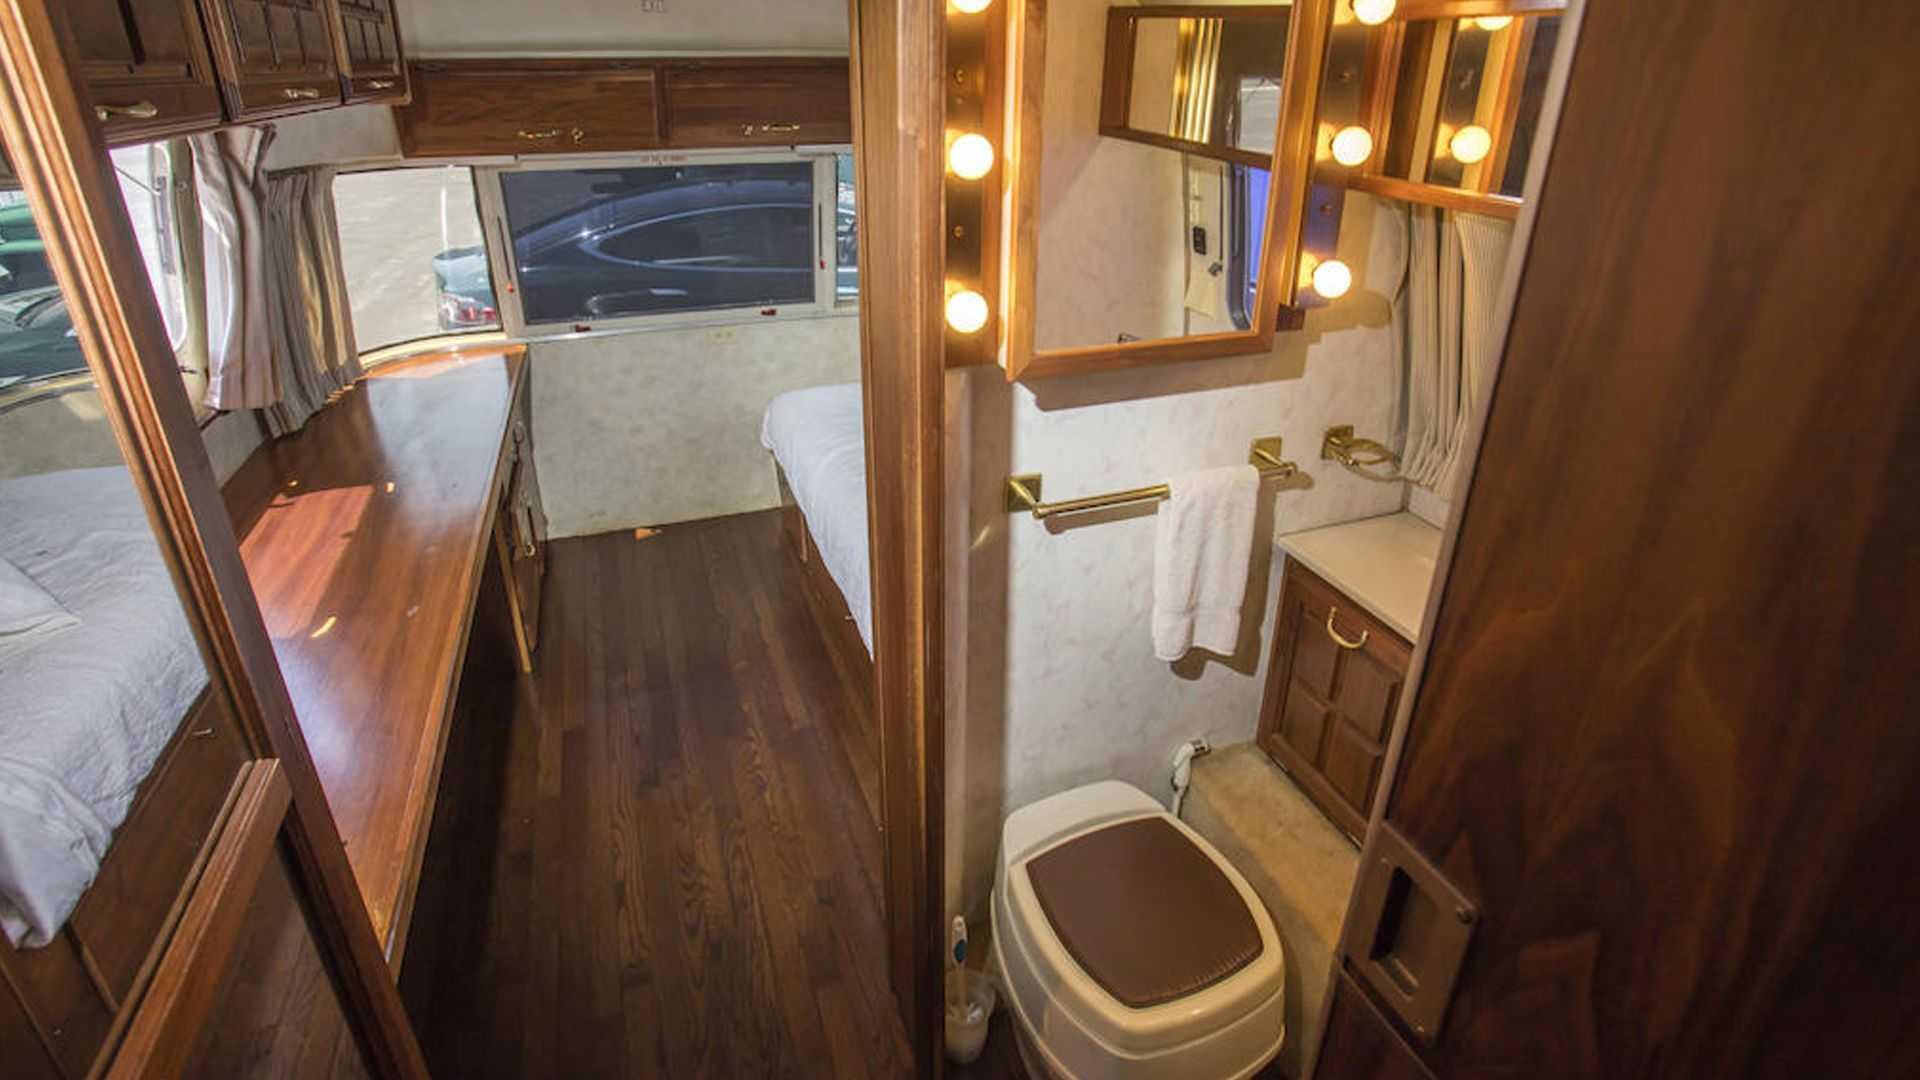 Tom-Hanks-Airstream-trailer-for-sale-13